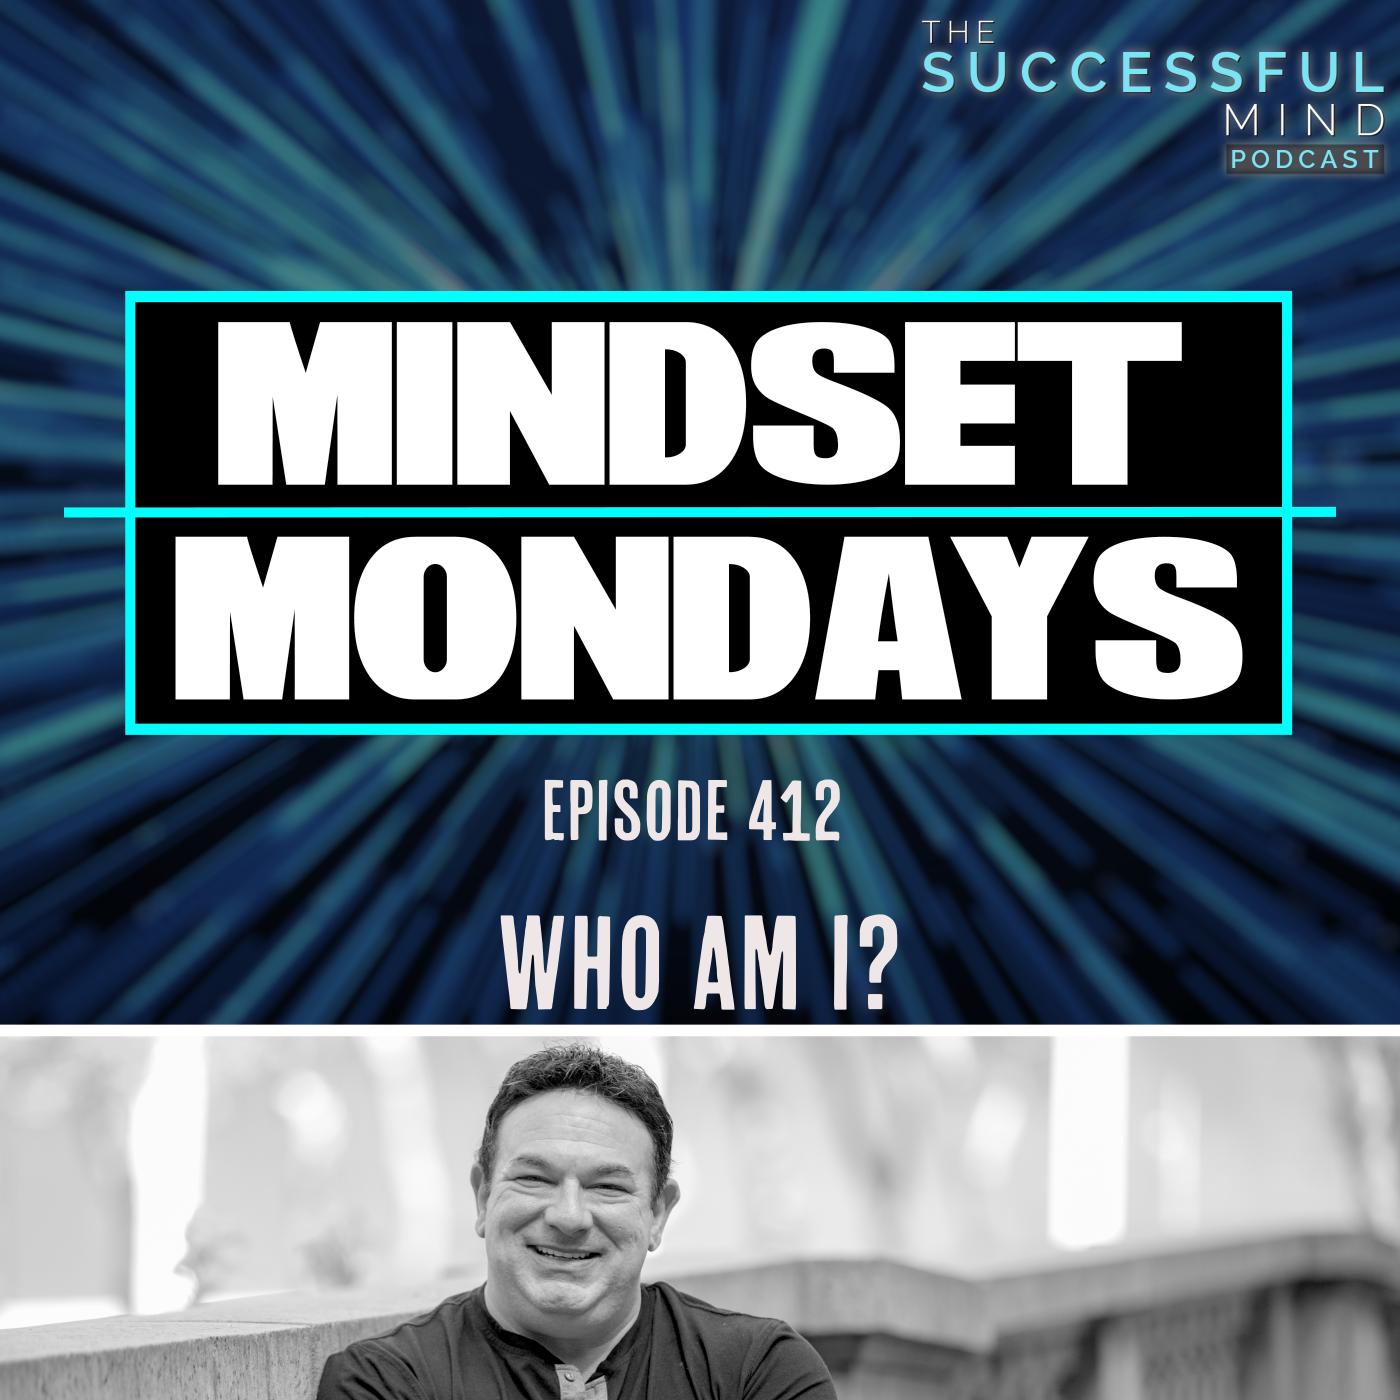 The Successful Mind Podcast – Episode 412 – Mindset Monday's – Who Am I?